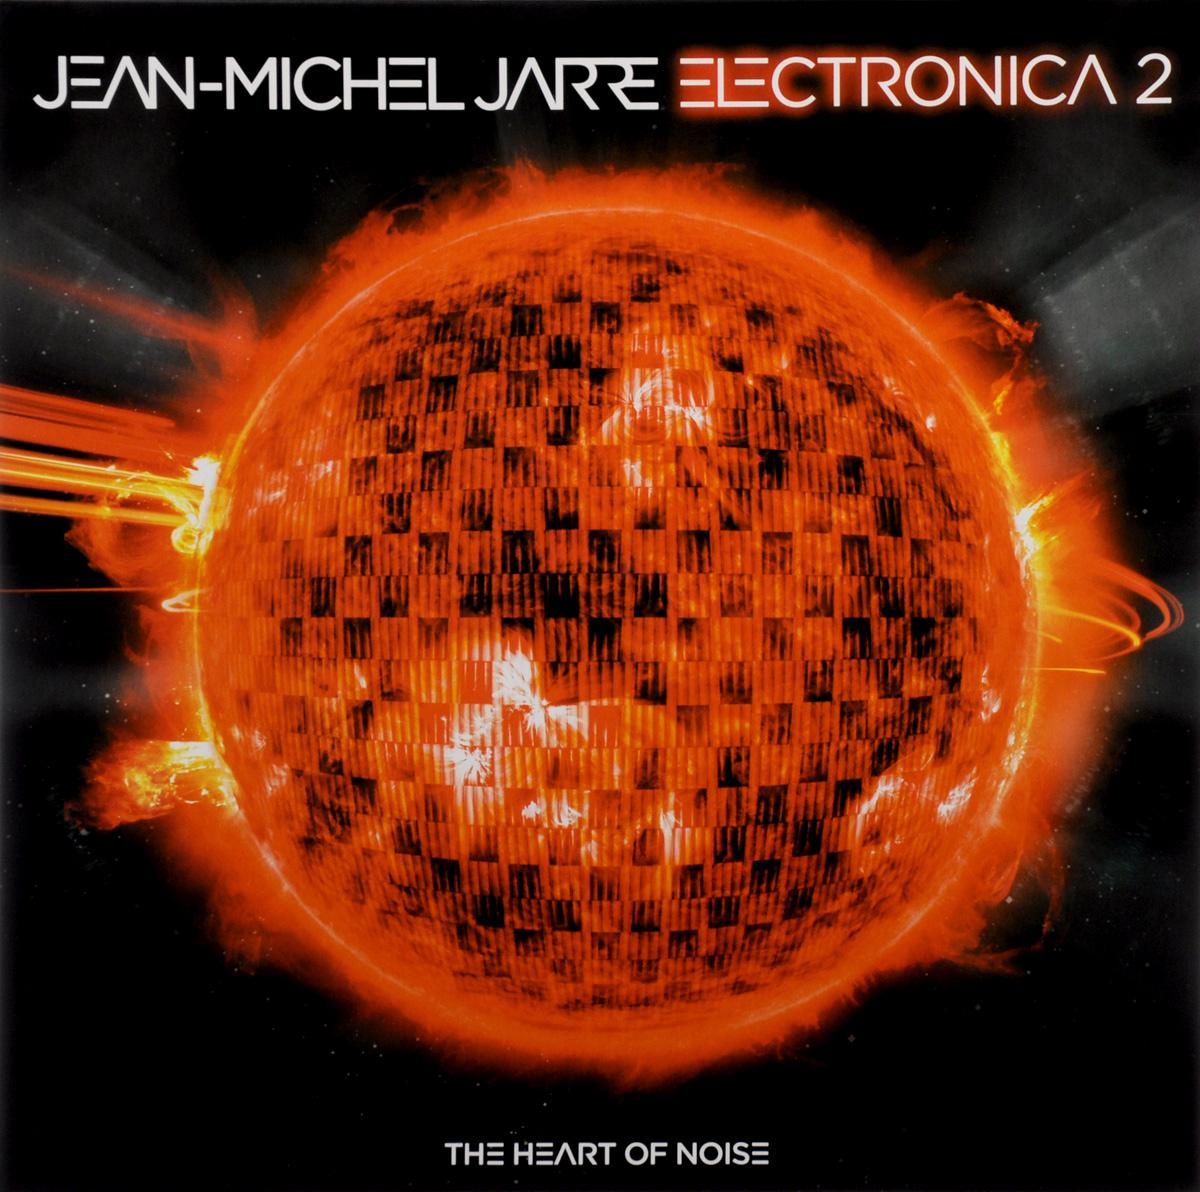 Жан-Мишель Жарр Jean-Michel Jarre. Electronica 2 - The Heart Of Noise (2 LP)